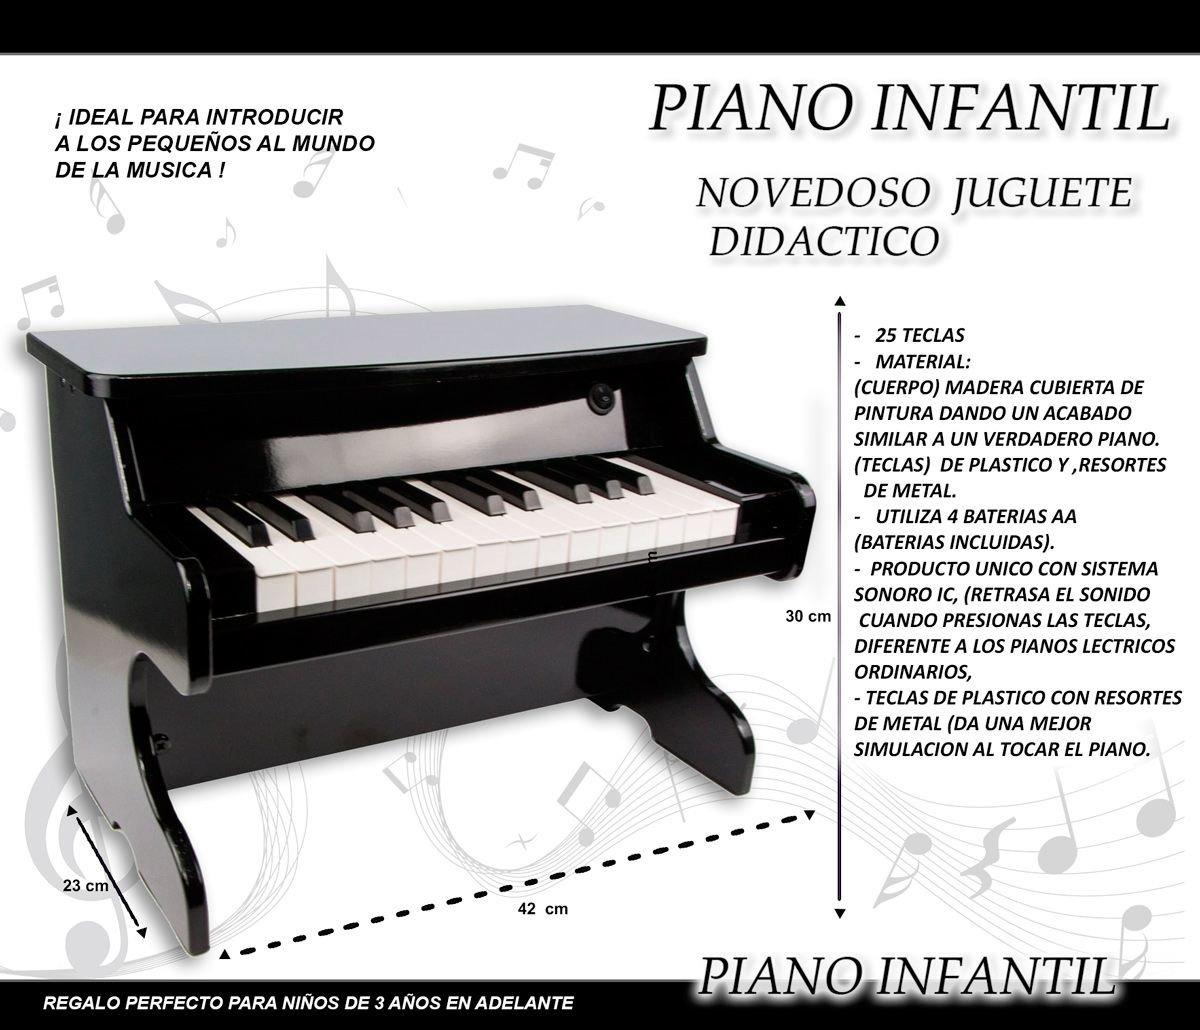 Baratos Niñas Teclas Piano Juguetes 1061 4jqrl3a5c Madera Pk Niños wPn80OkX